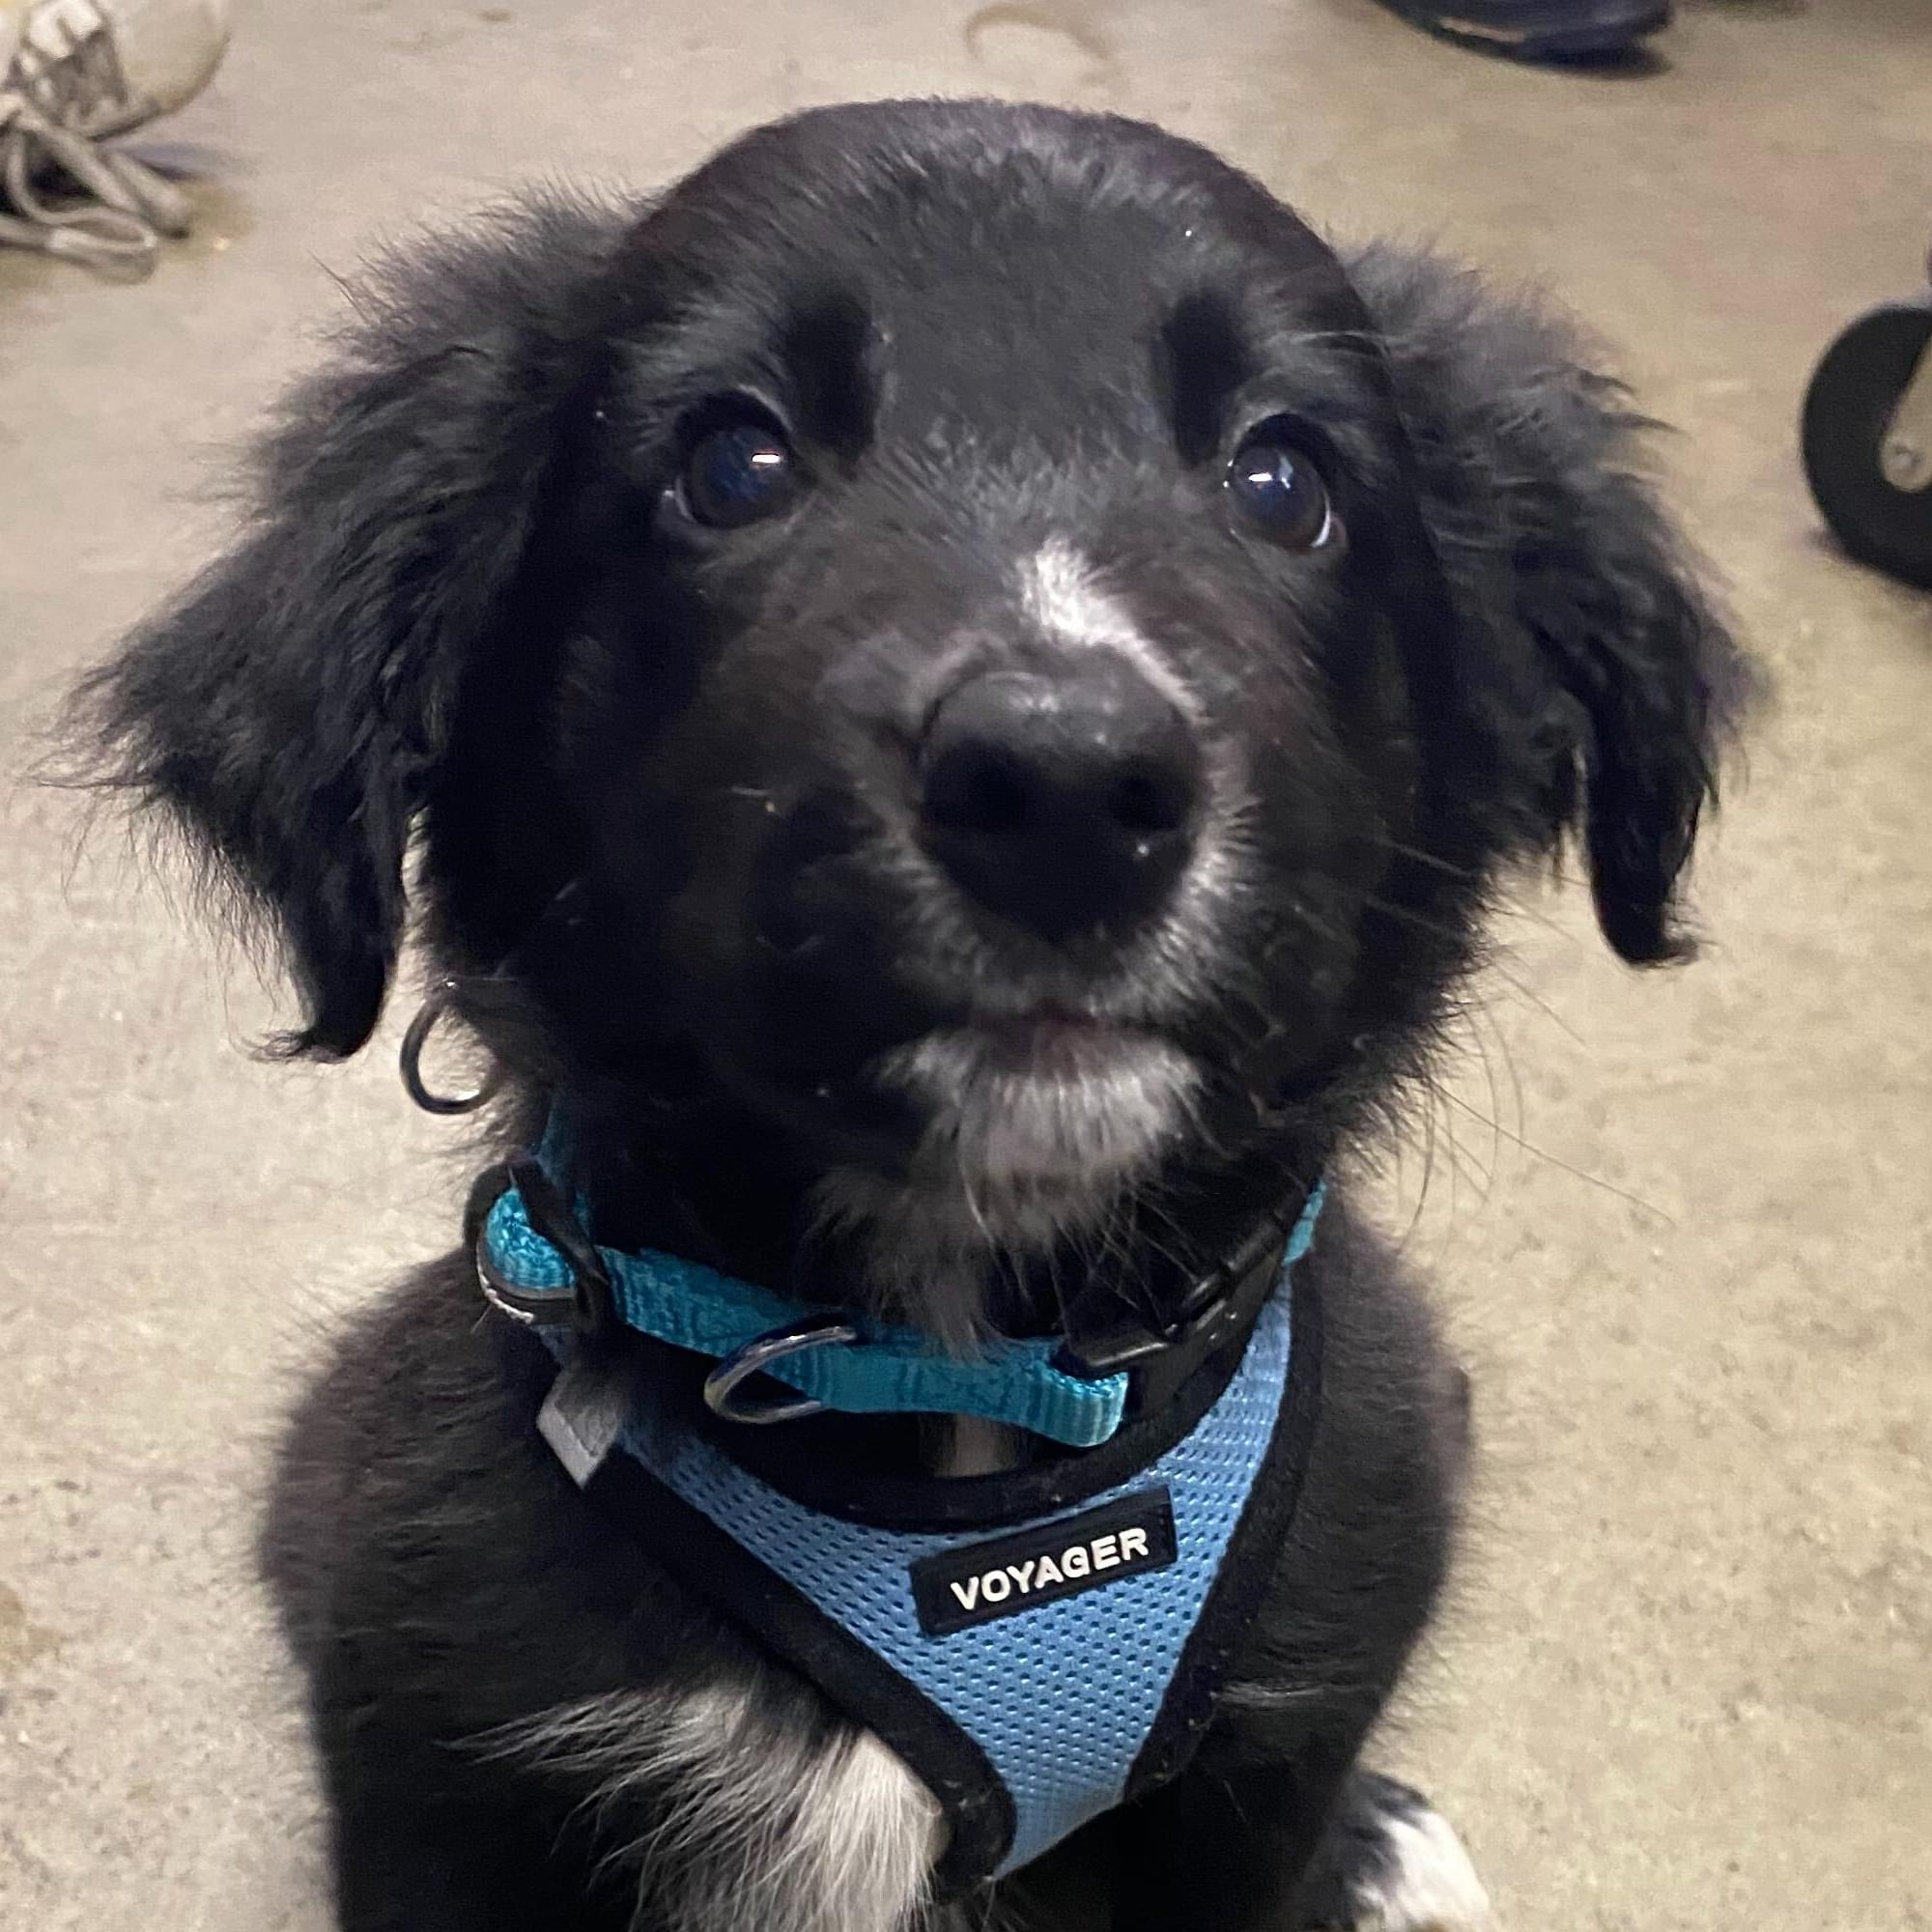 Adopt Olive at the RISPCA!